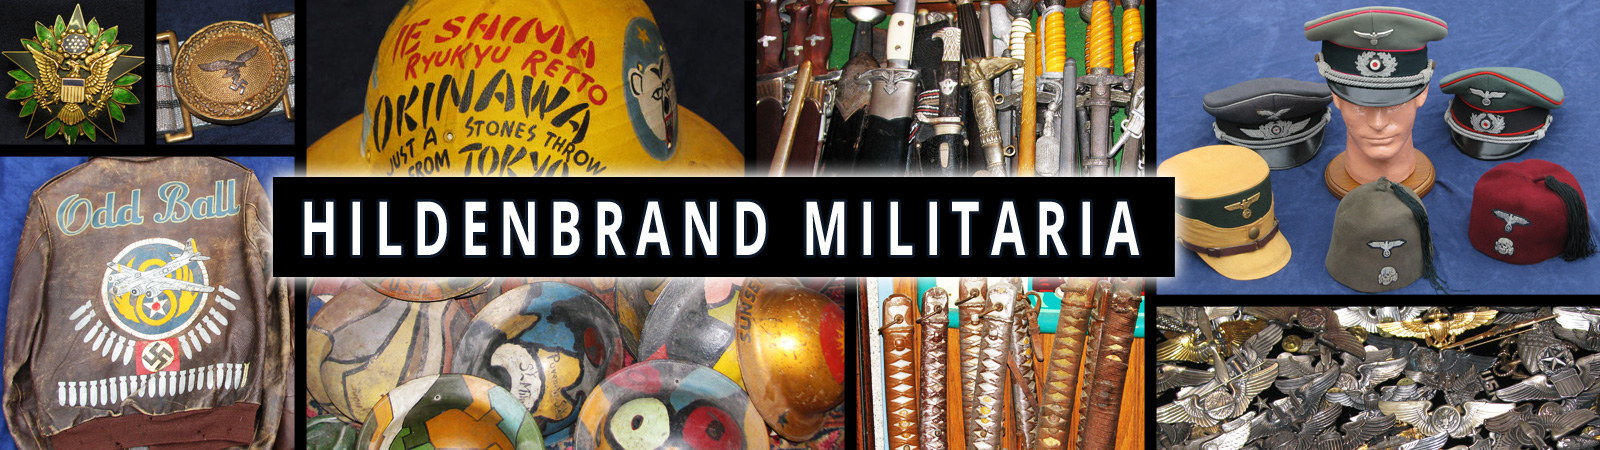 Hildenbrand Militaria